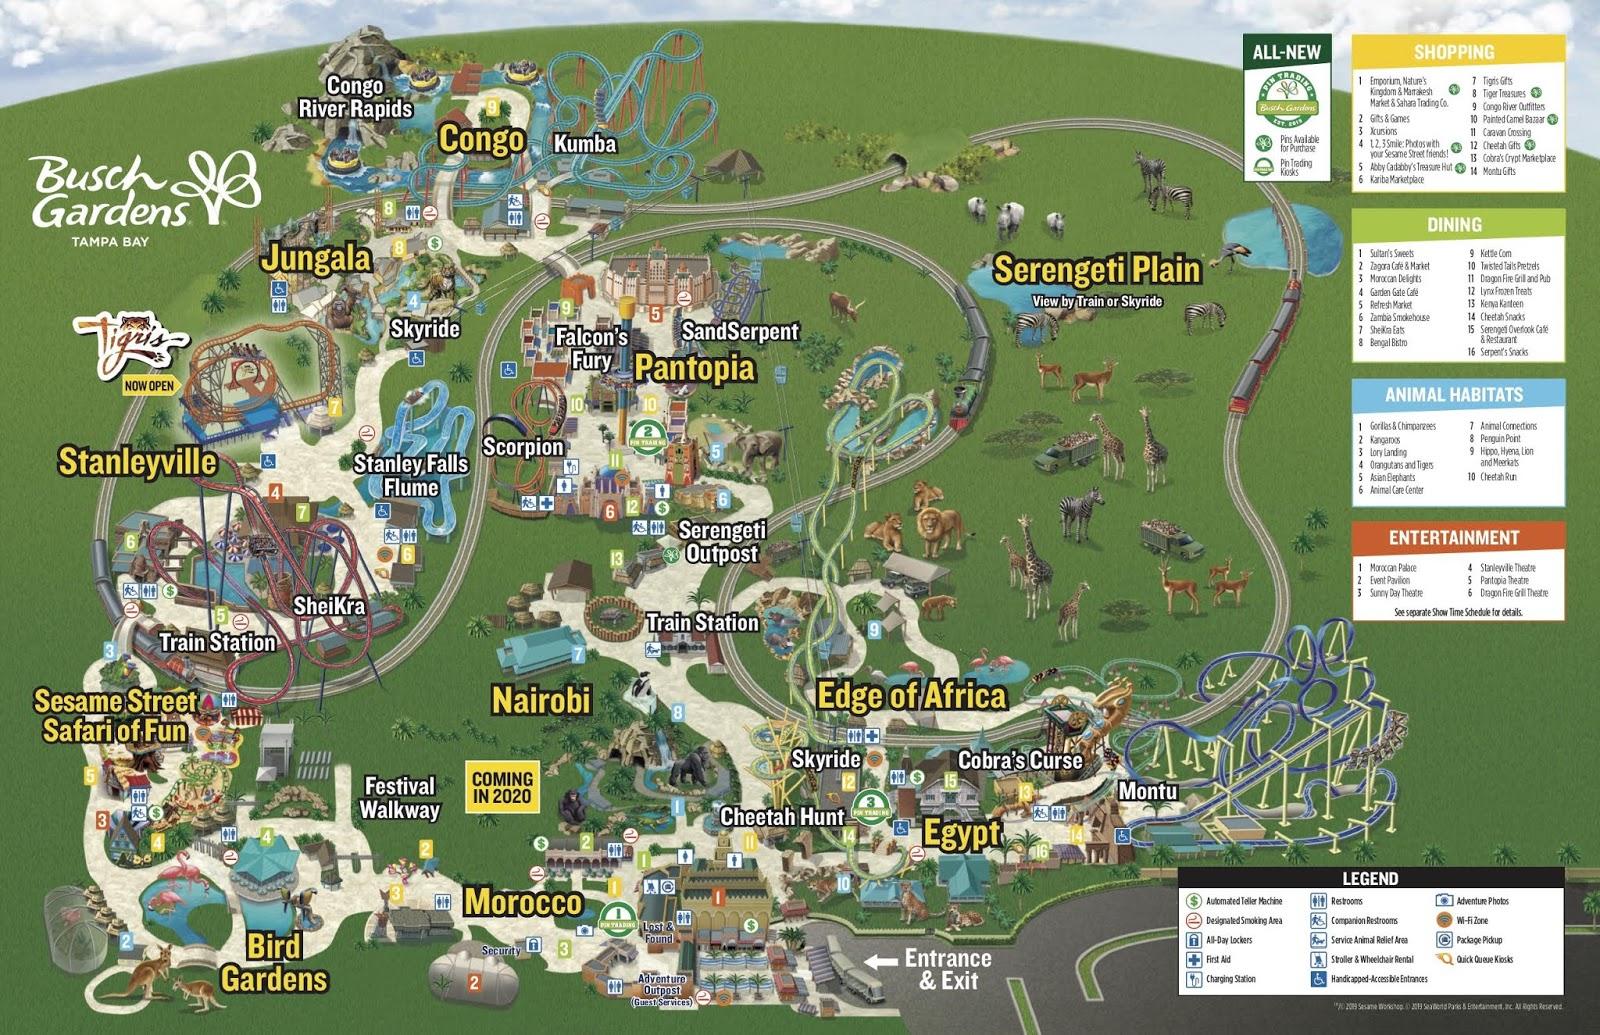 Mapa Parque Busch Gardens